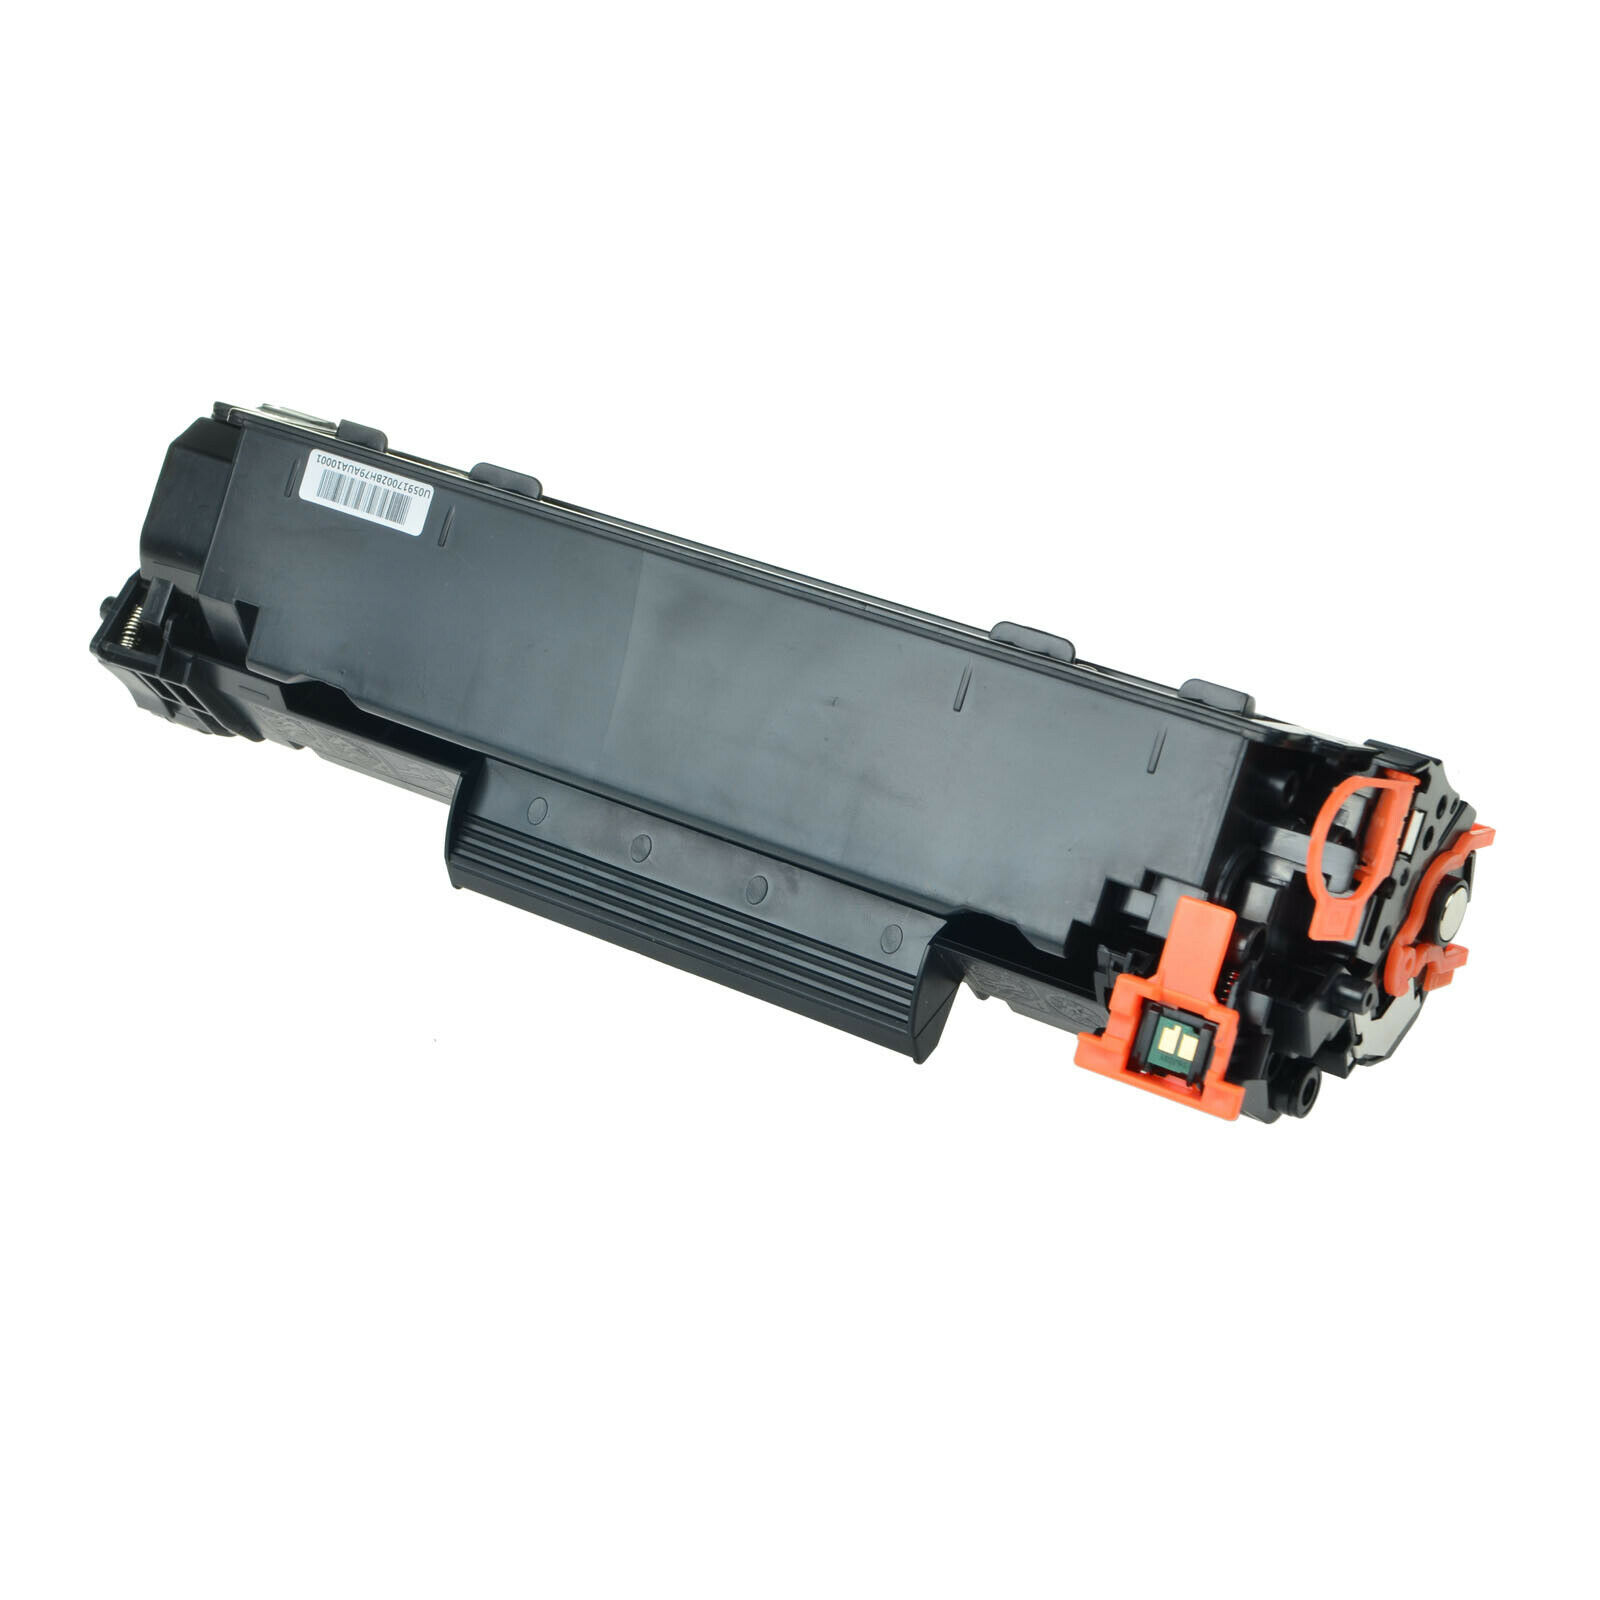 3PK CF279A 79A Black Toner Cartridge For HP LaserJet Pro MFP M26nw Printer - $27.99